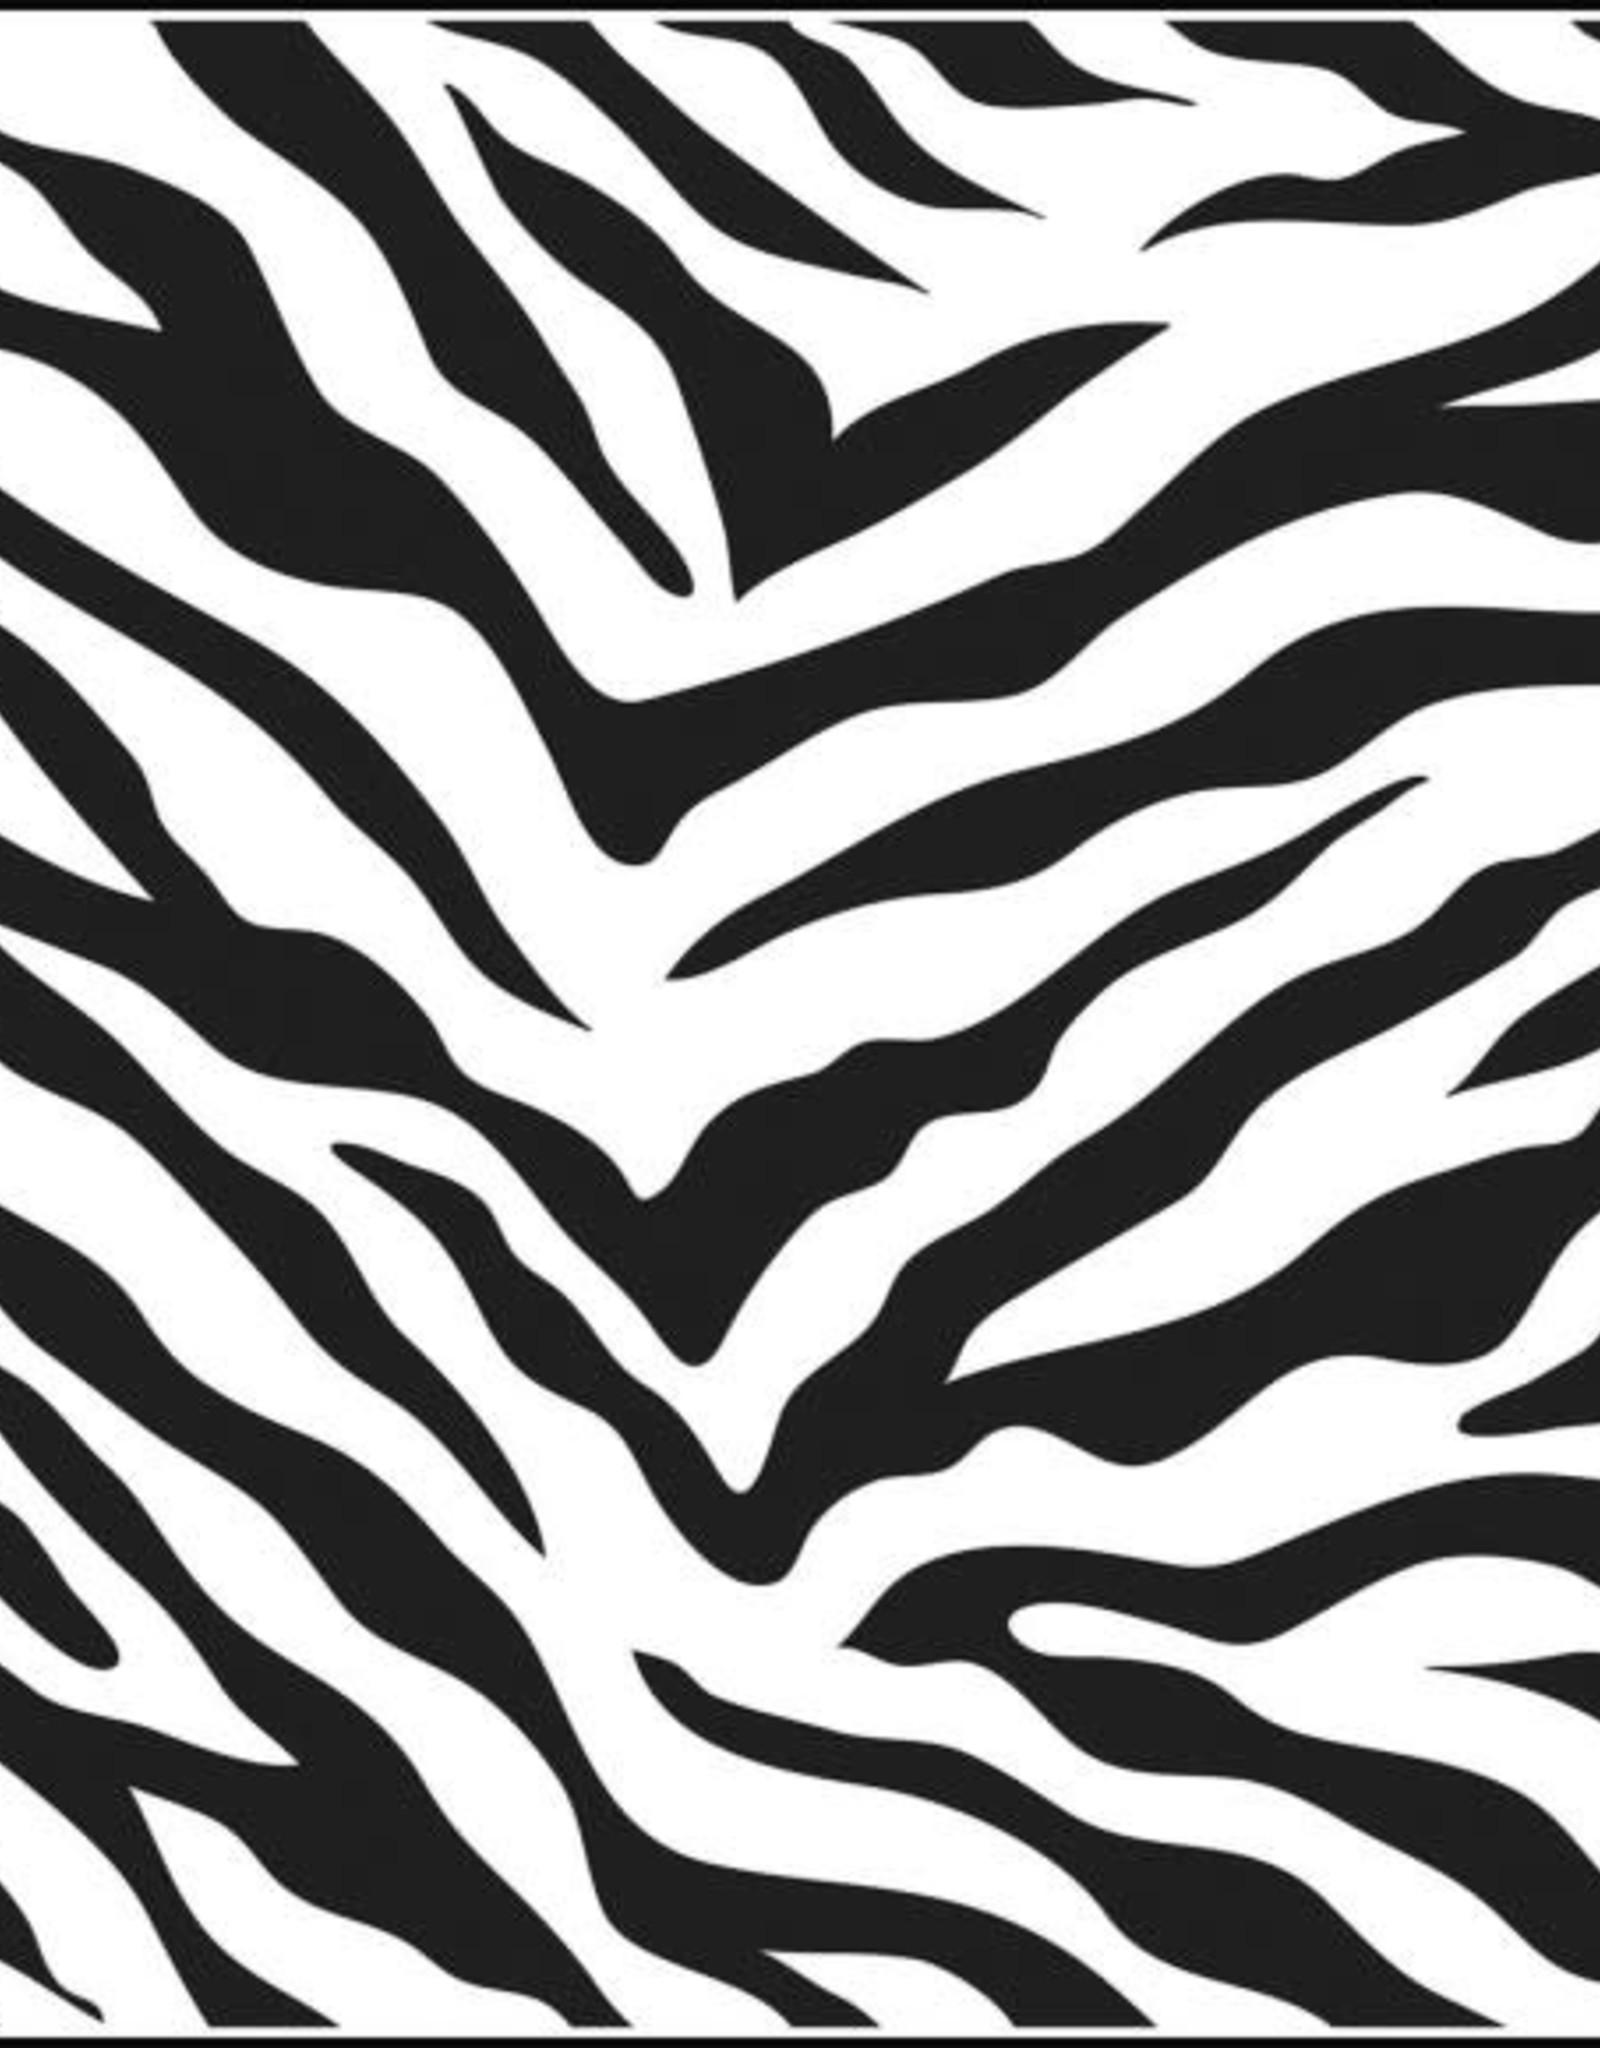 Stencil Zebra Print large